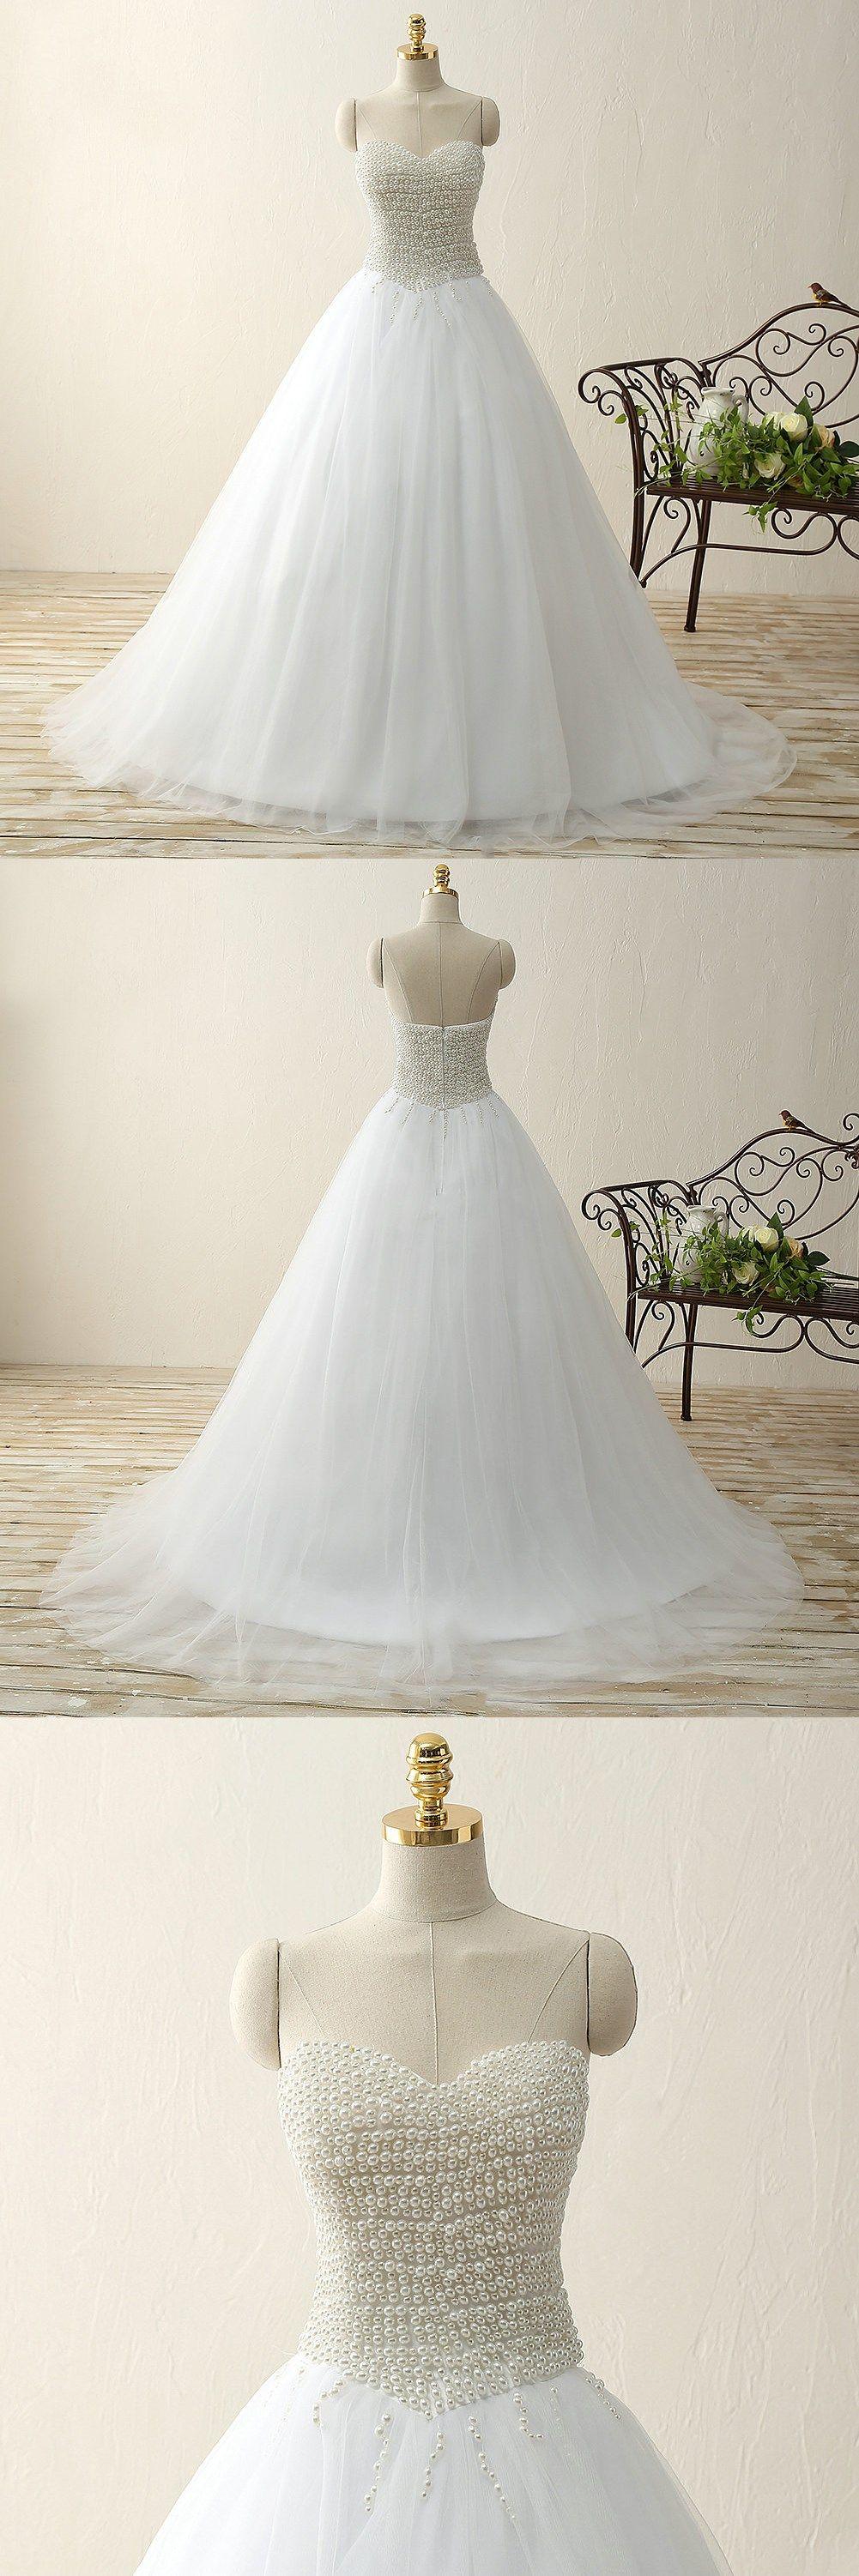 Romantic wedding dresses sweetheart pearl ball gown sweep train